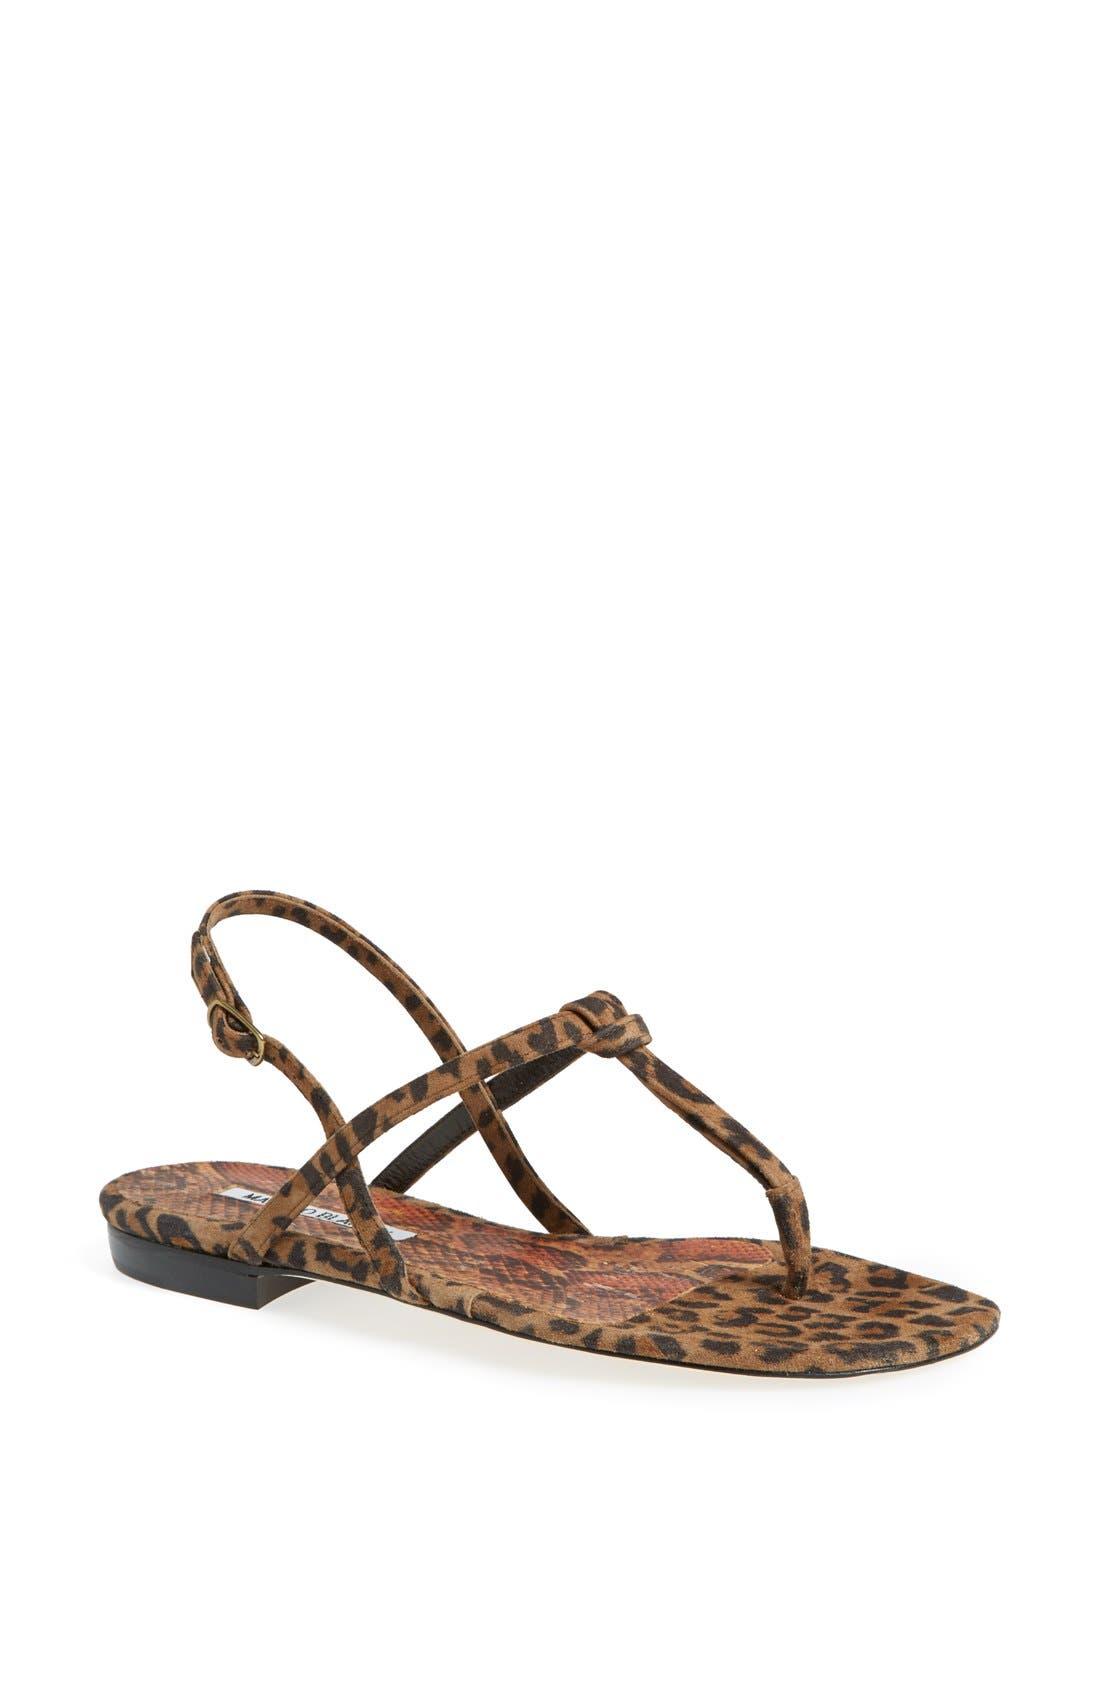 Main Image - Manolo Blahnik 'Valig' Sandal